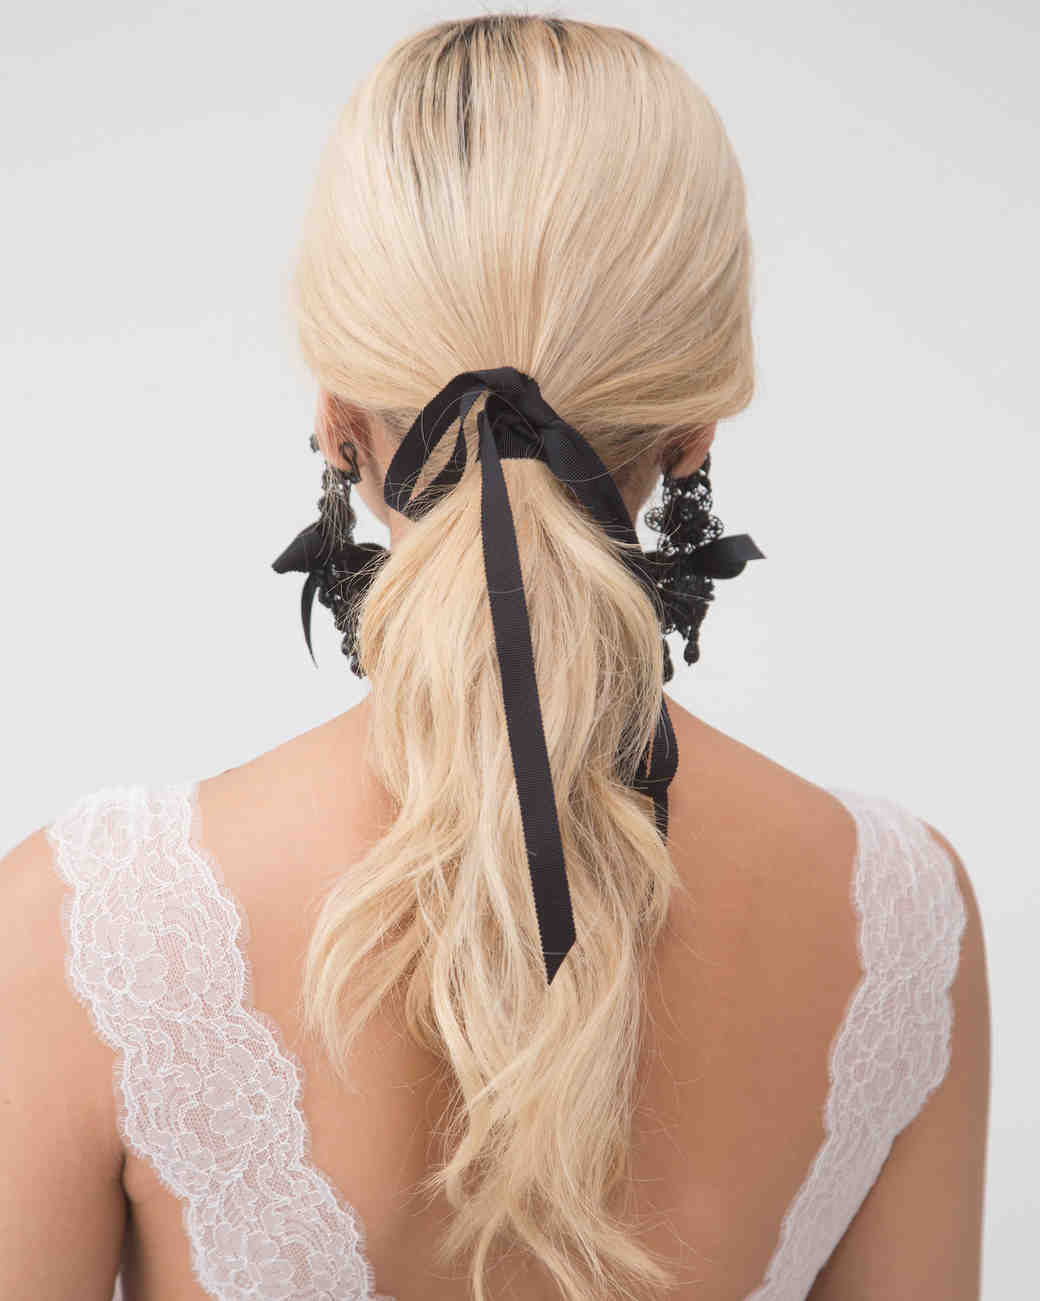 parisian-inspired-blog-mariage-coiffure-tendance-2018marchesa-couture-spring-2018-bfw-hairstyle-0417_vert.jpg